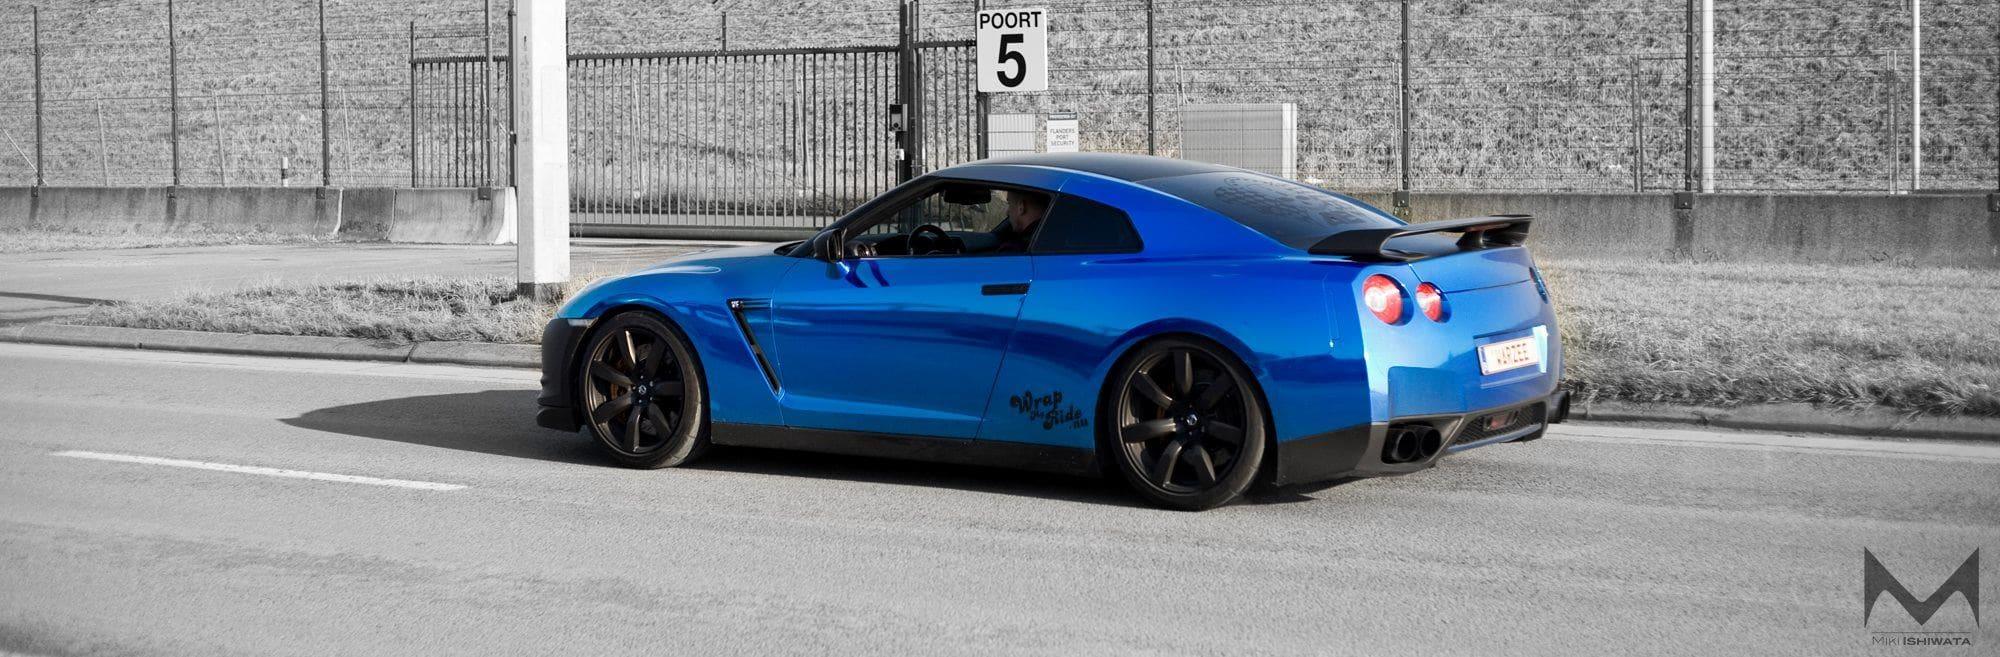 Bling-bling Blauwe WMR GT-R Gespot